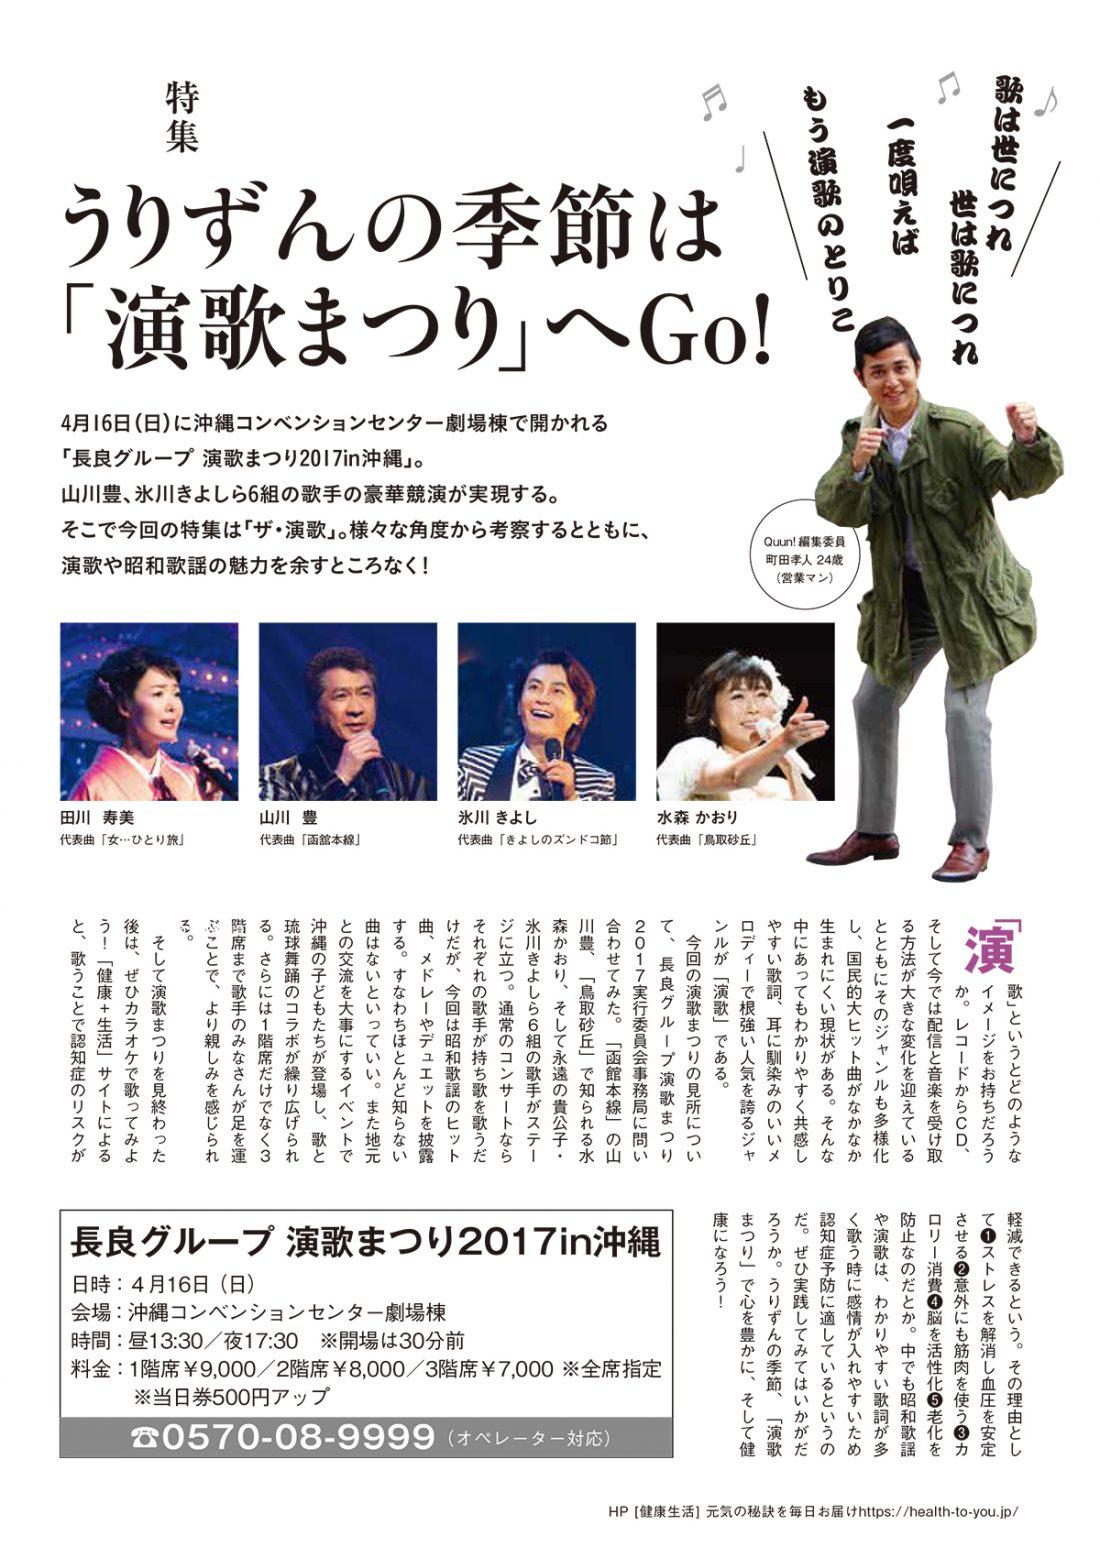 https://www.qab.co.jp/qgoro/wp-content/uploads/quun_0702-1100x1558.jpg